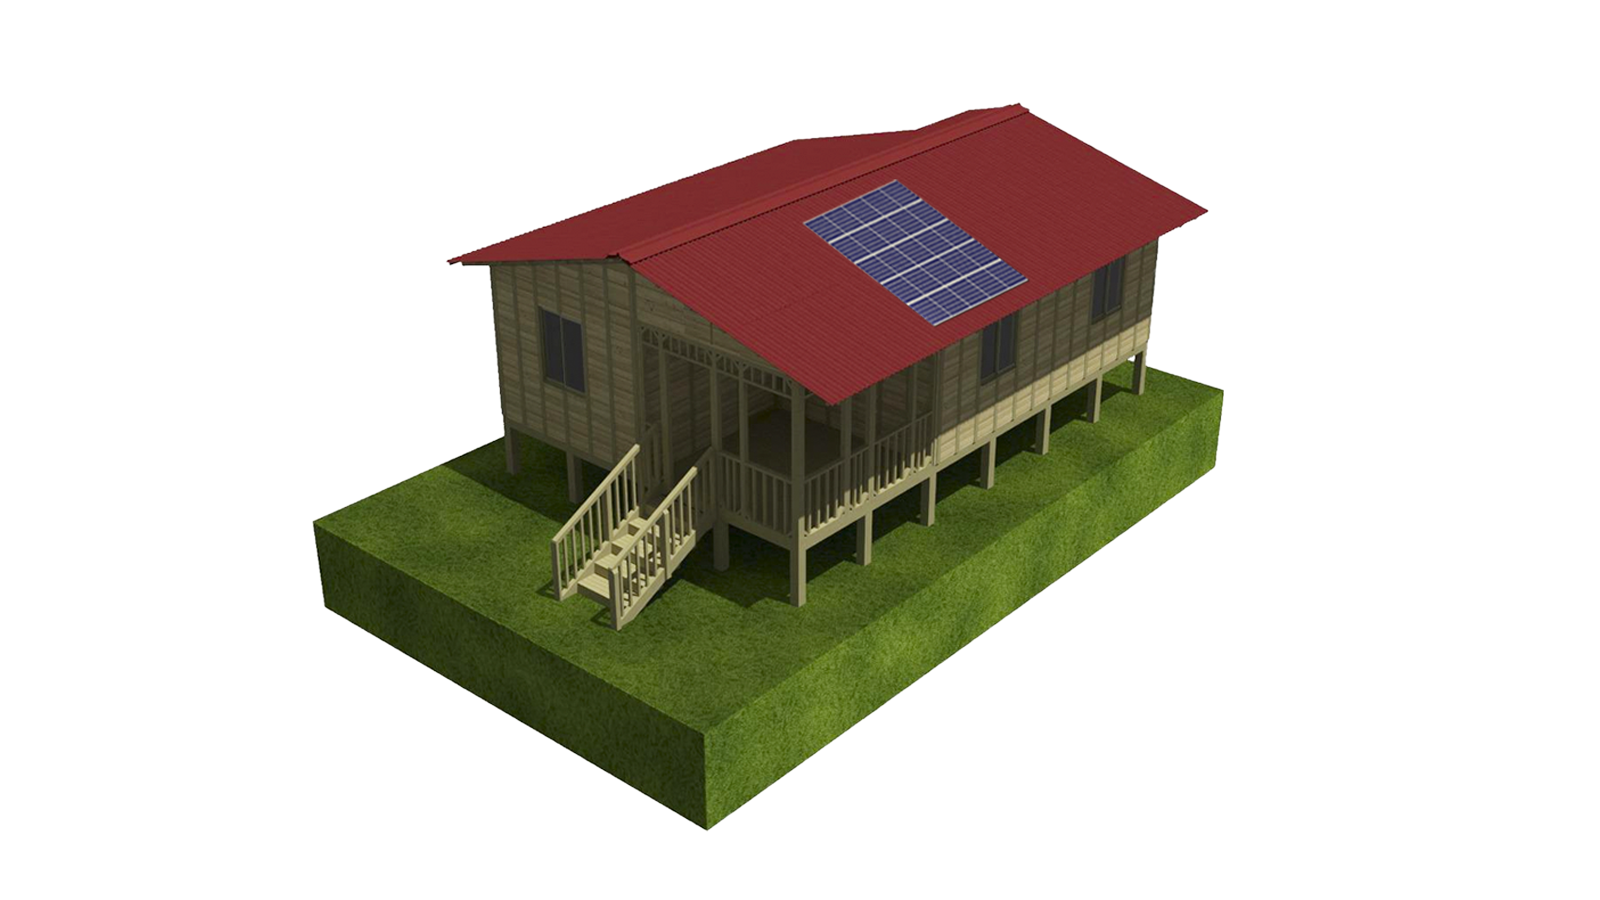 hoyennoticia.com, Celsia dará energía a 50 casas en San Andrés, que donará empresa colombiana